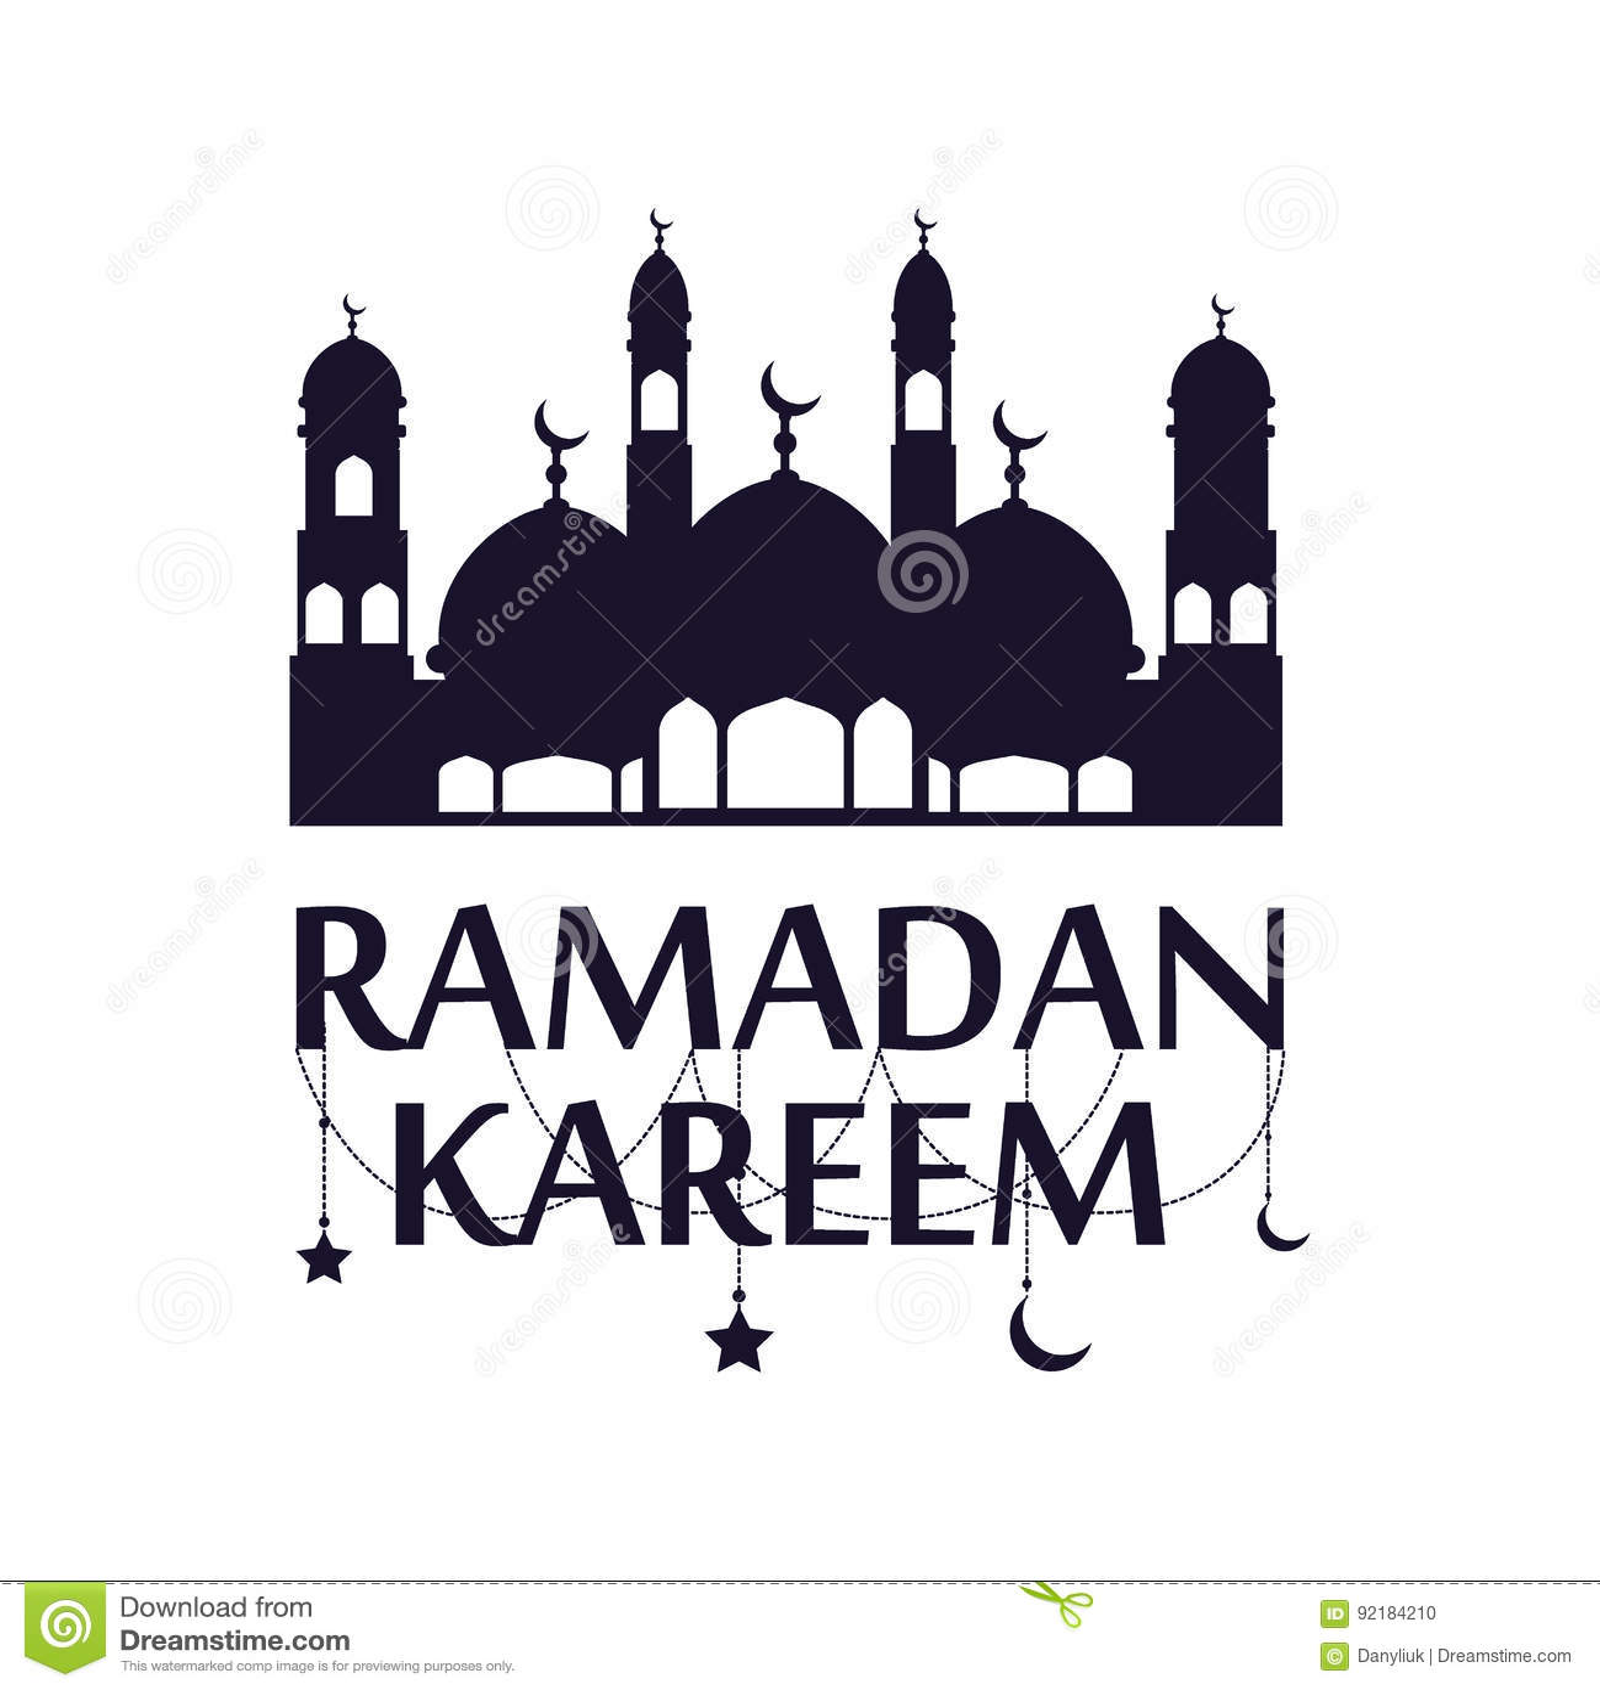 Traditional ramadan kareem art month celebration greeting card download traditional ramadan kareem art month celebration greeting card festival design vector stock vector illustration m4hsunfo